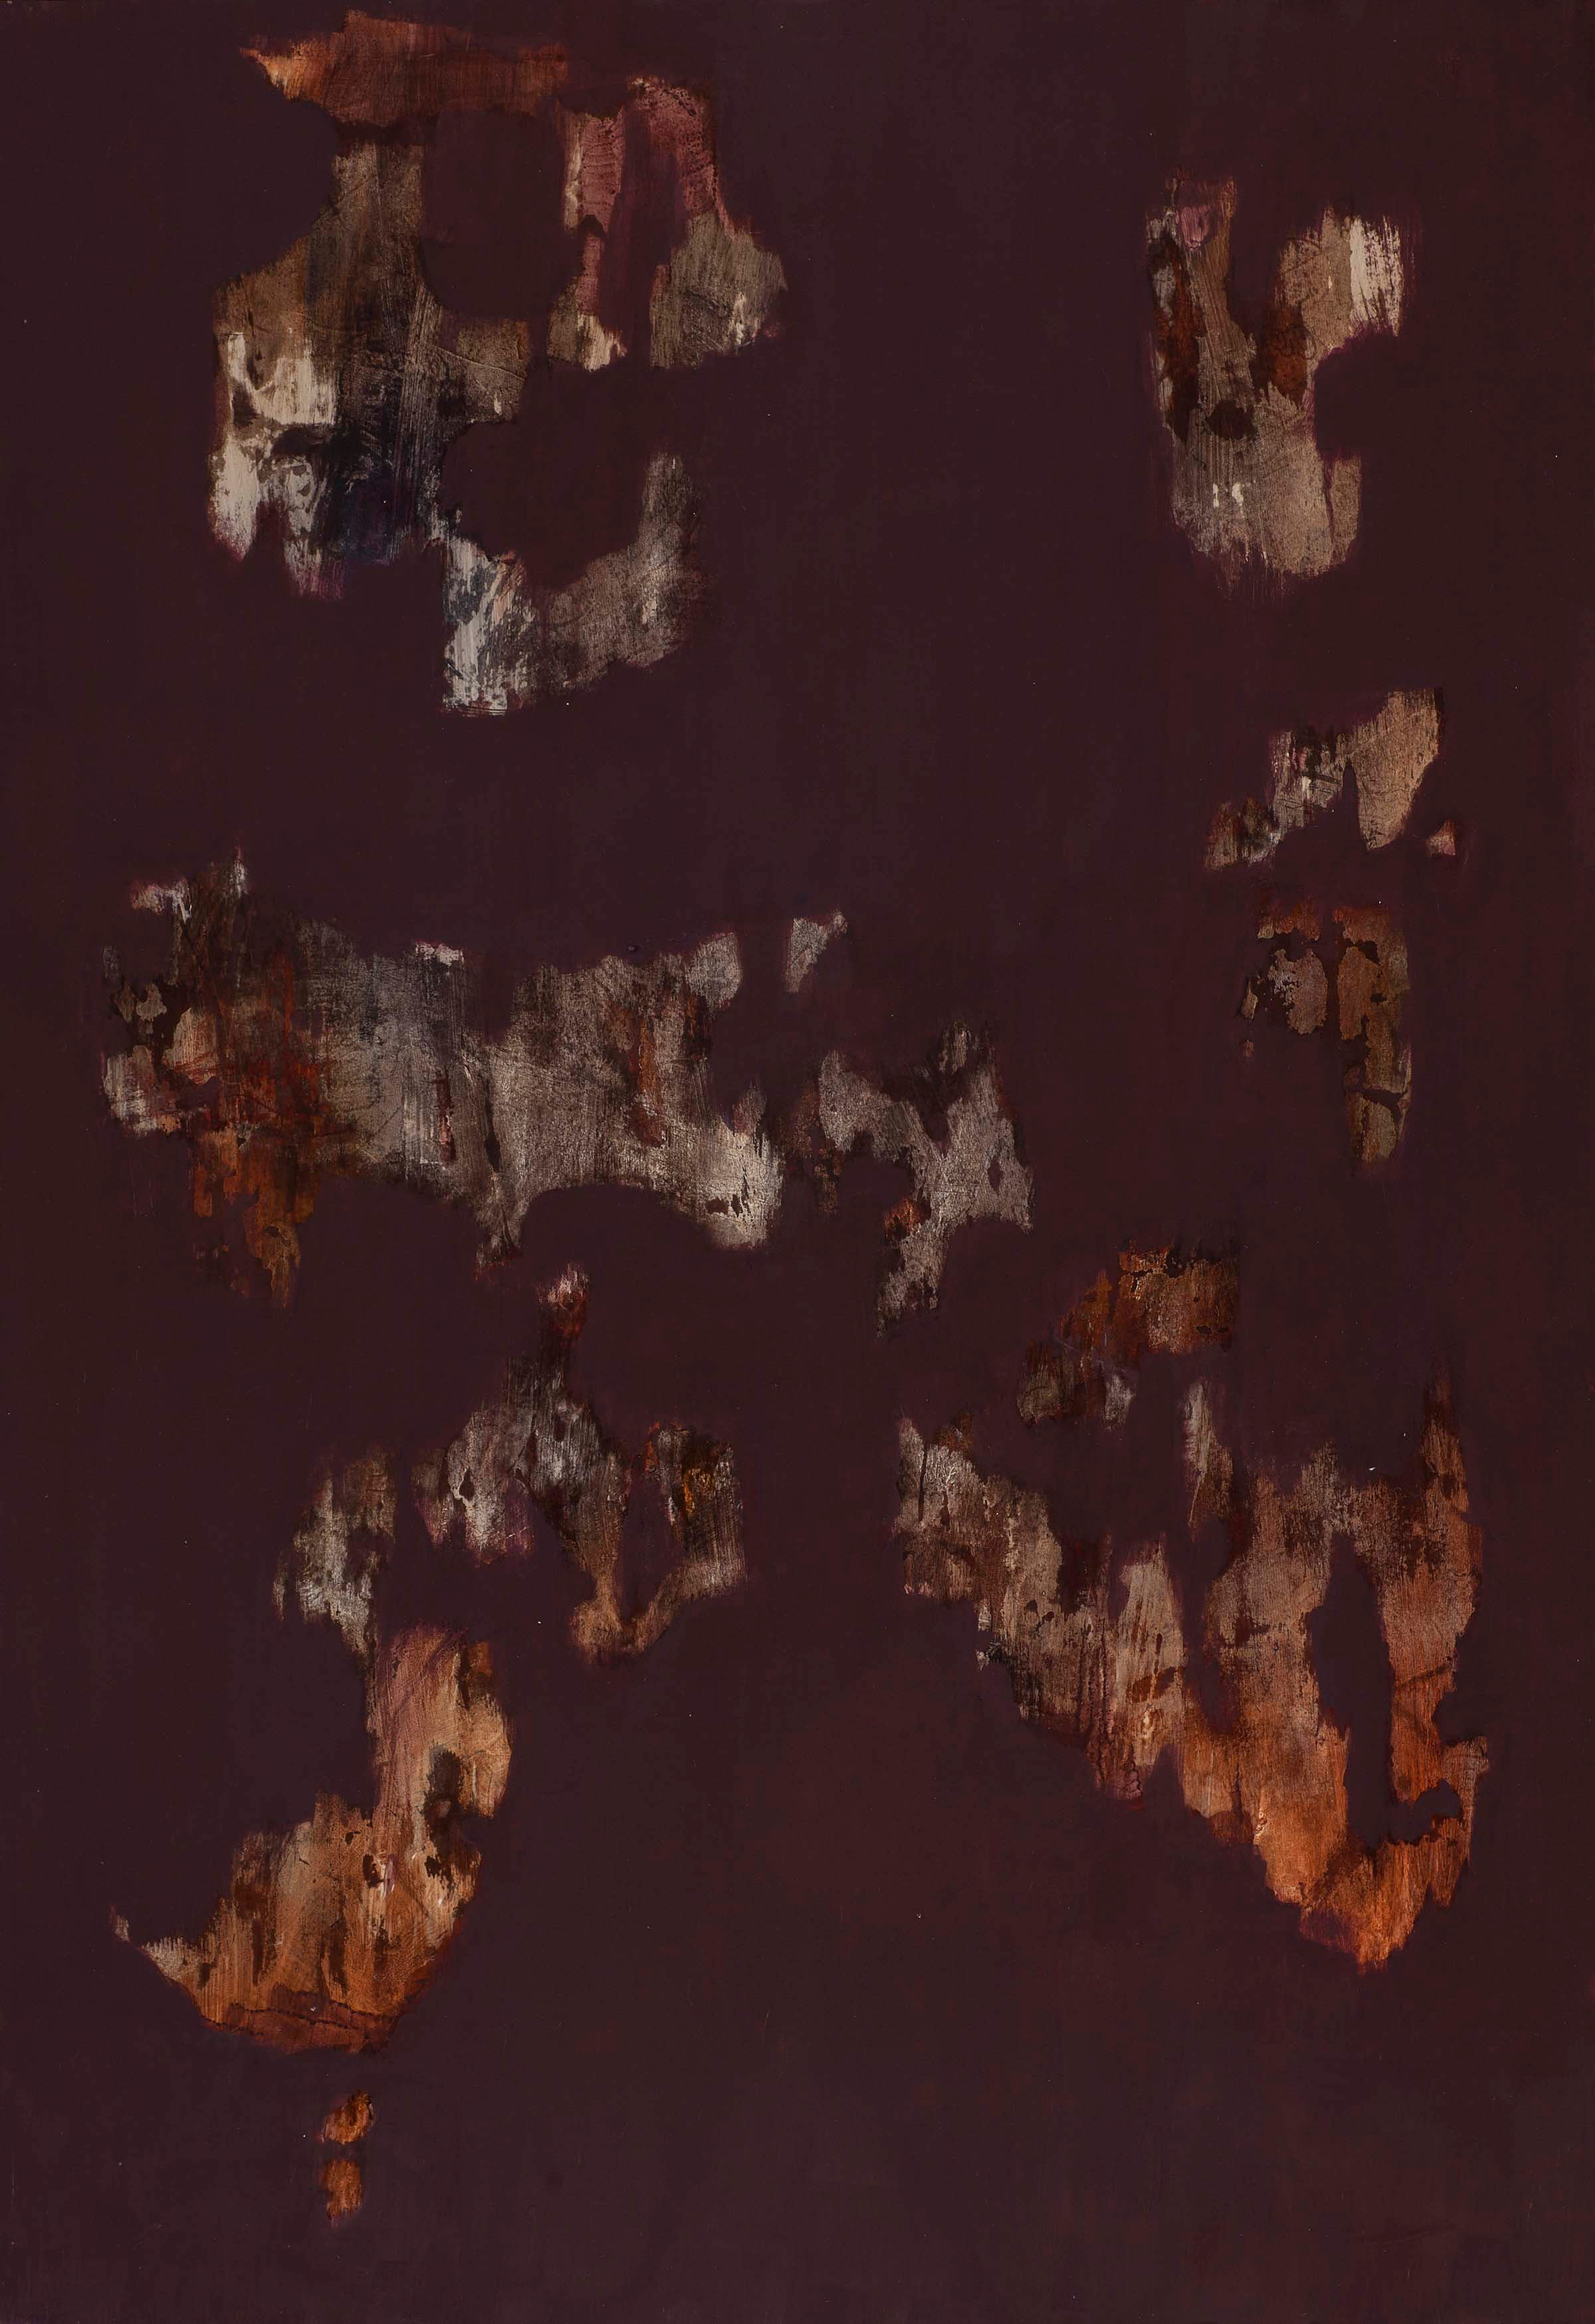 Earth Fragments by Karen Poulson   ArtworkNetwork.com